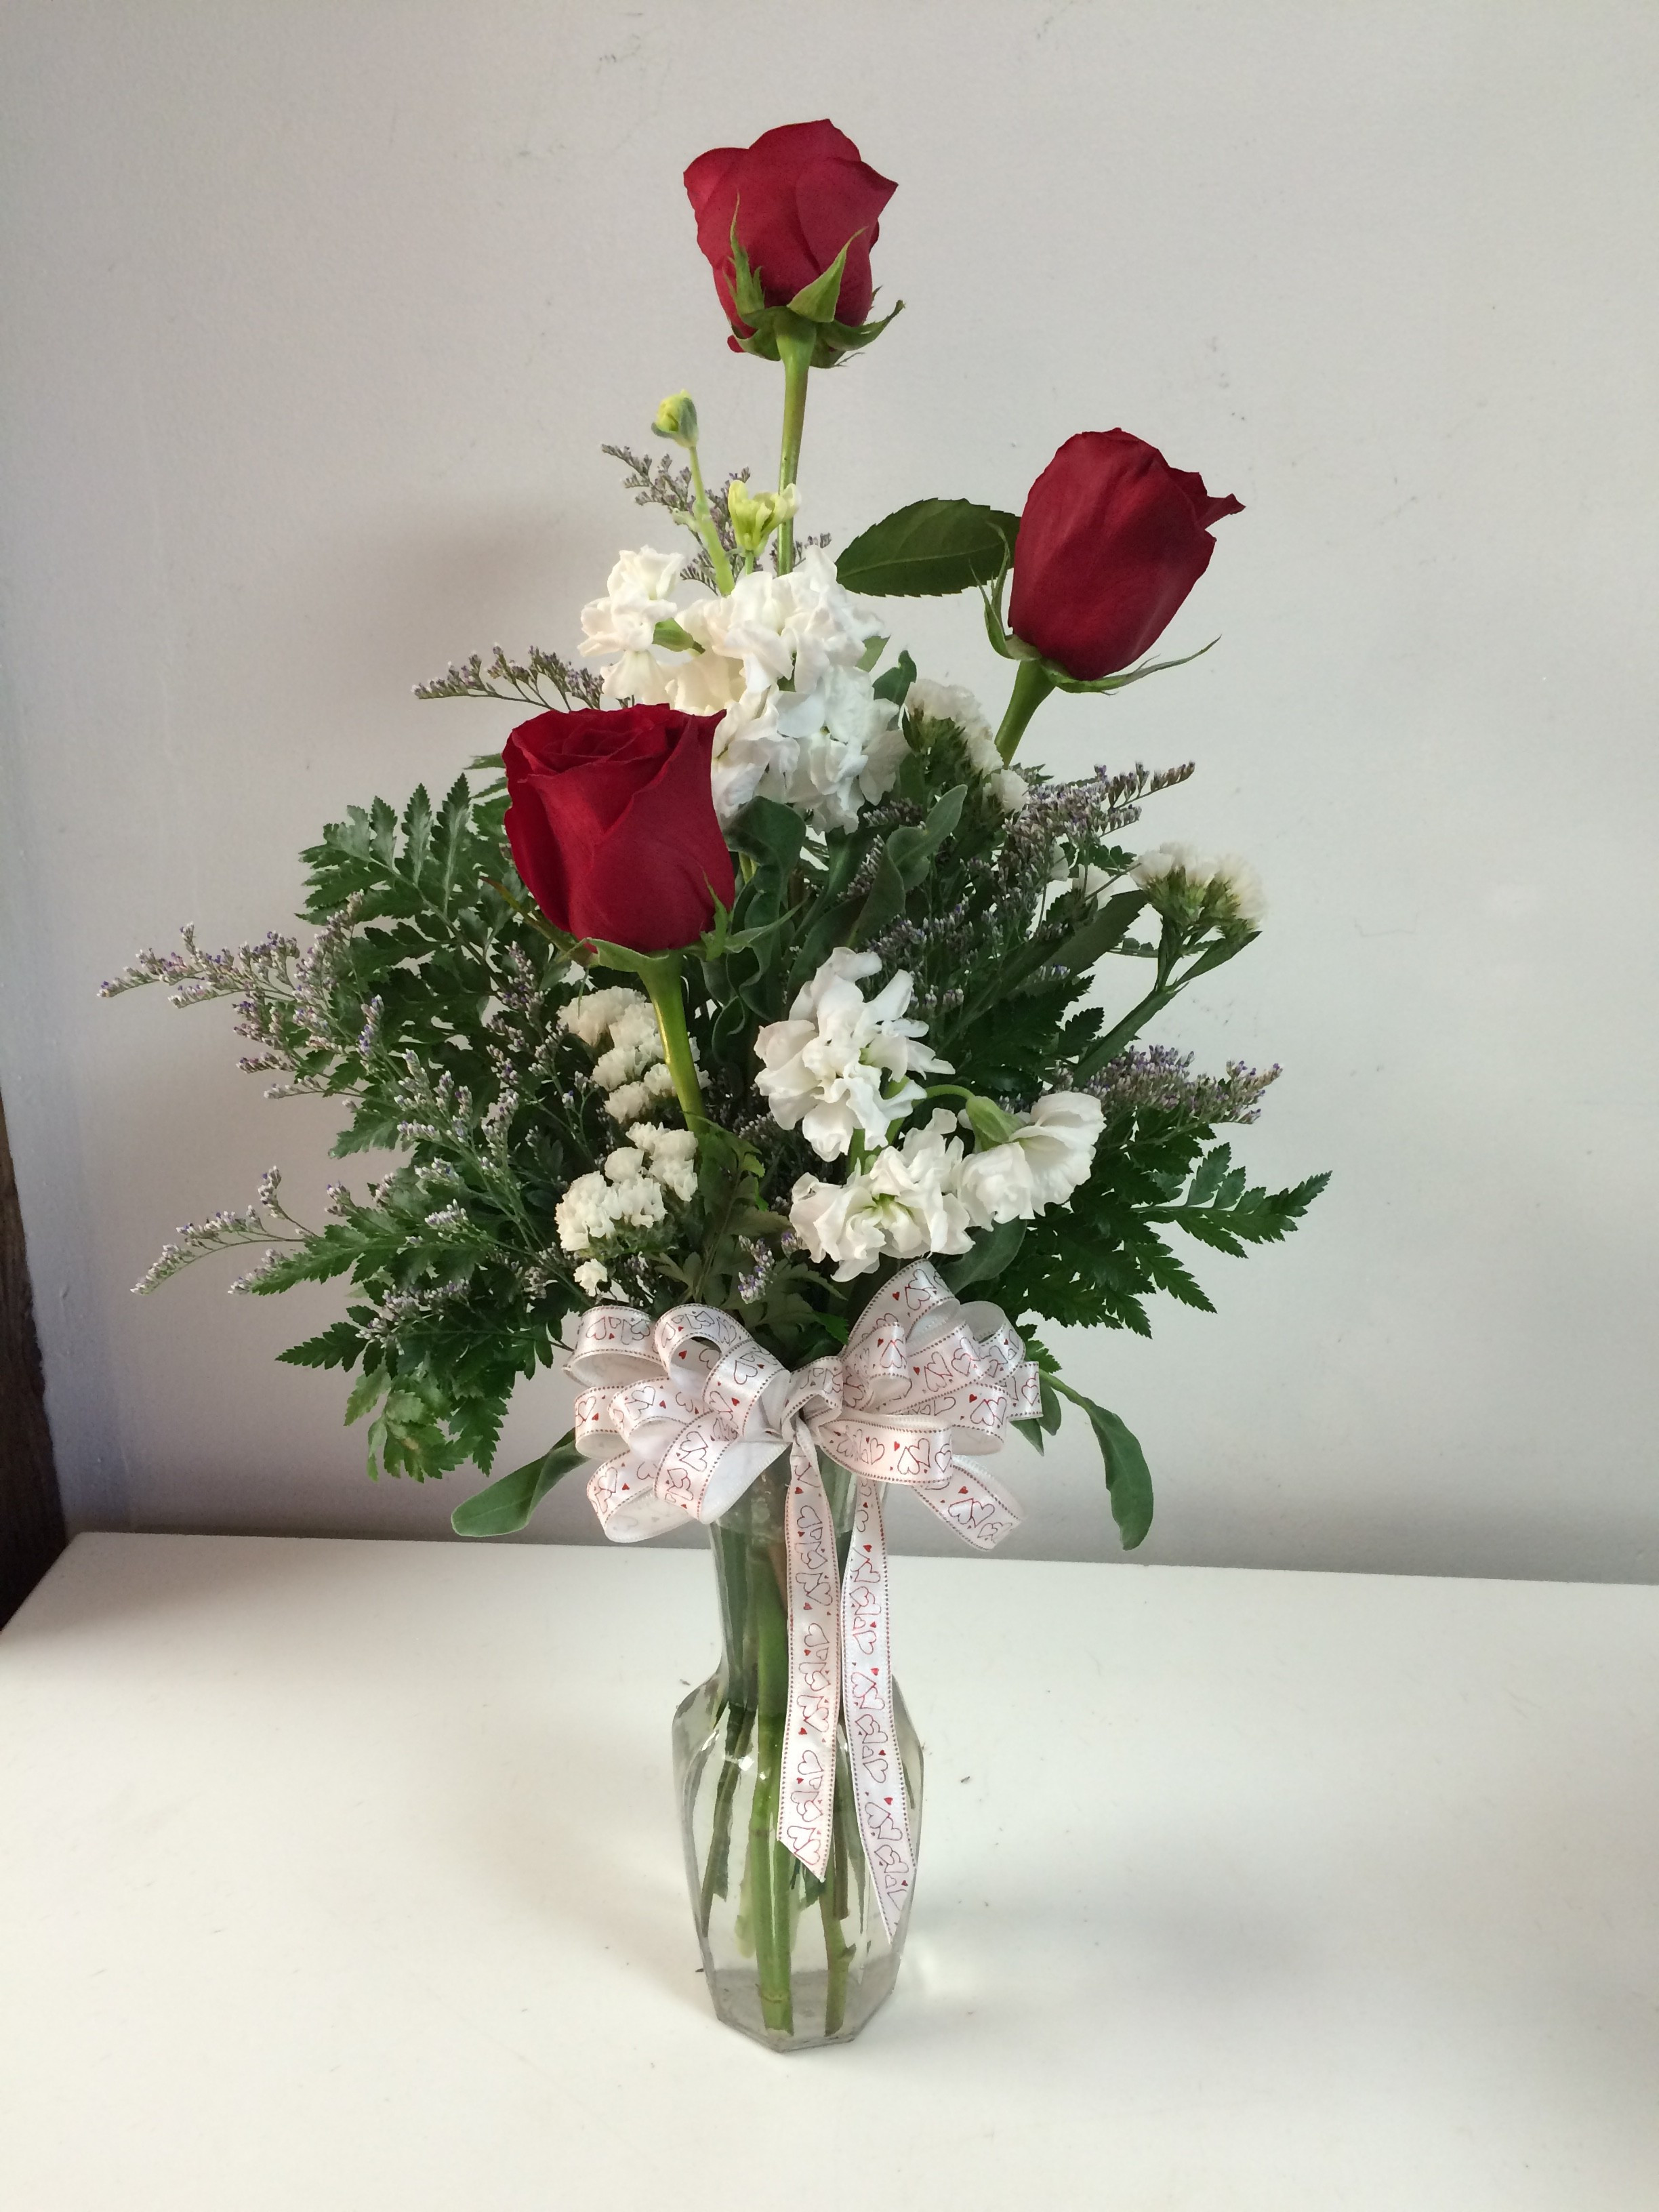 Stay In the Vase Cemetery Flowers Of Elk City Florist Flower Delivery by Broadway Flowers In Triple Roses